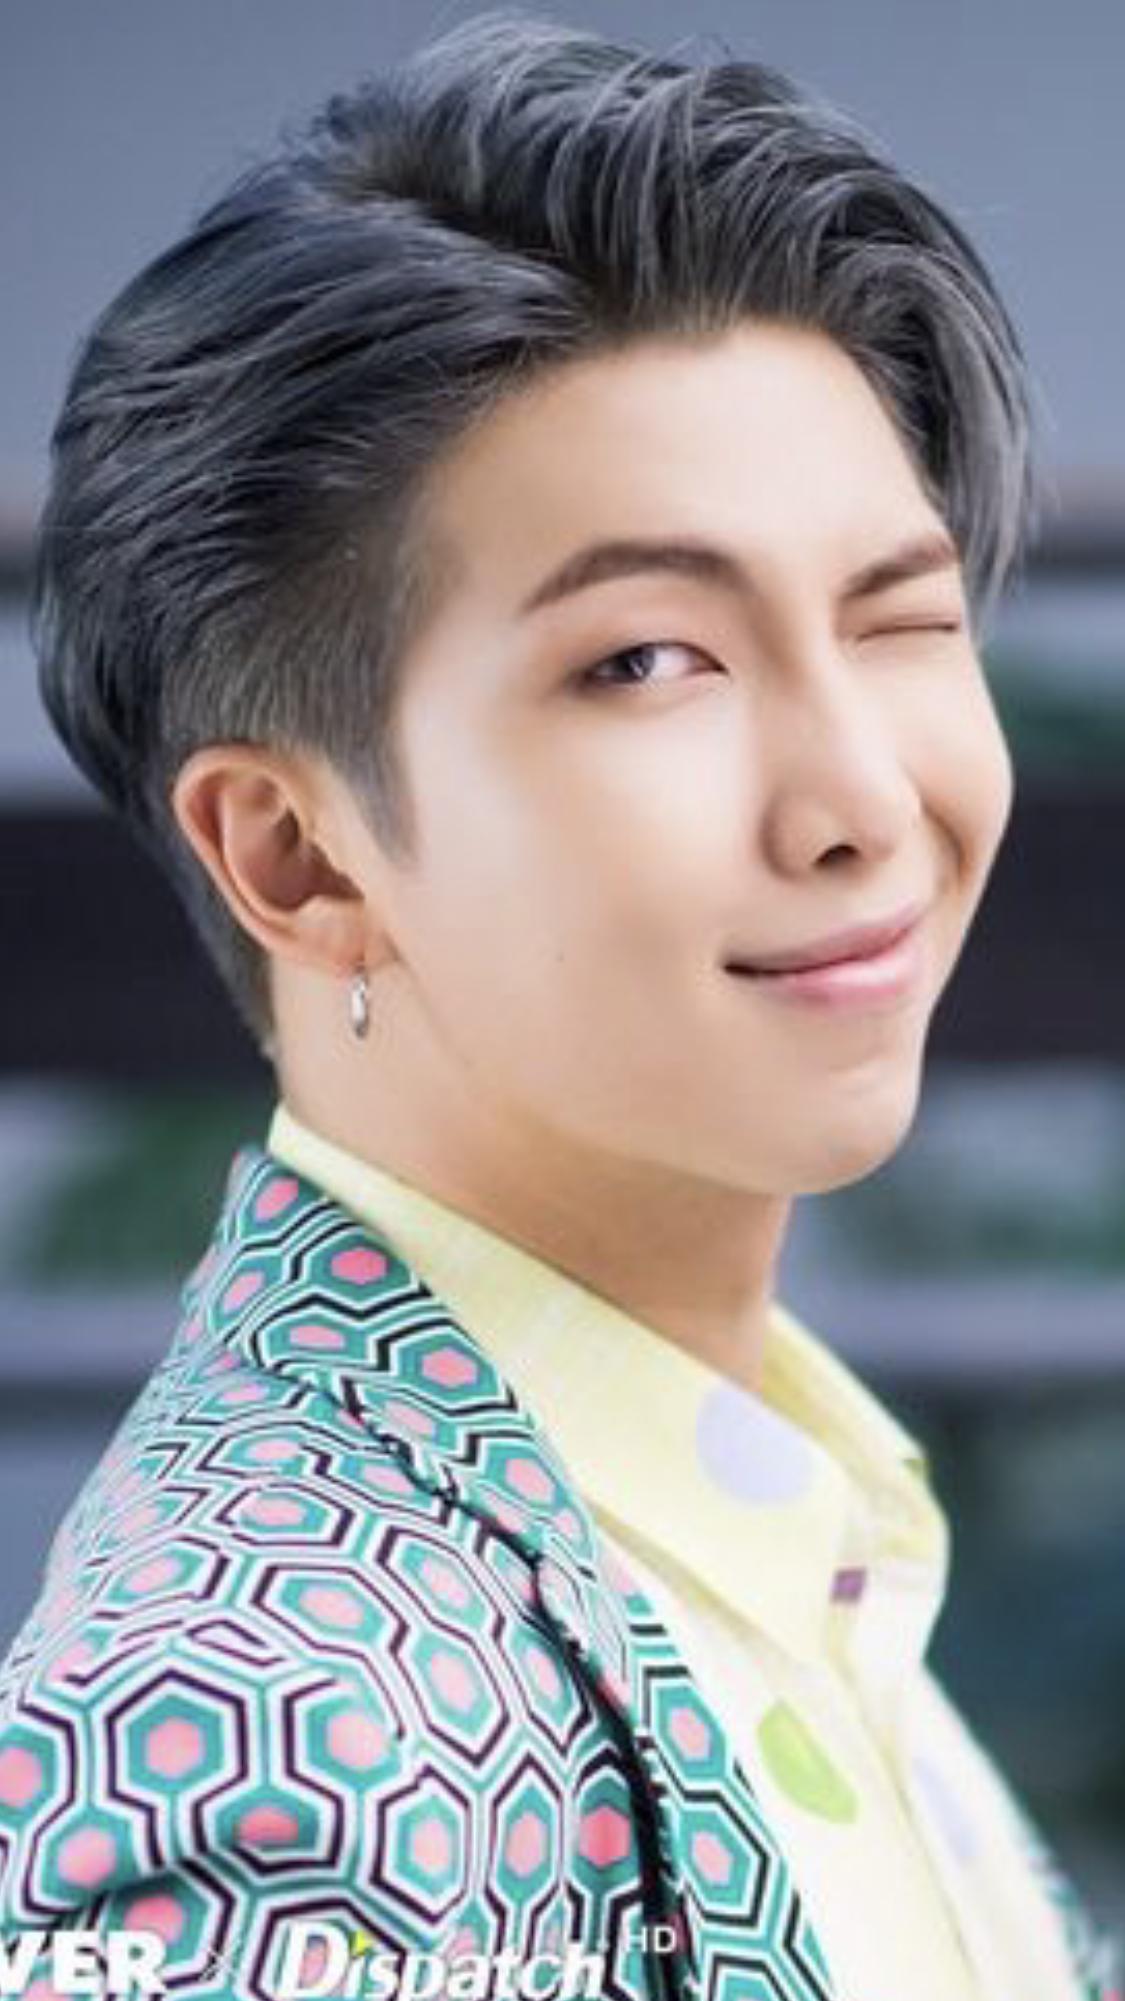 Naverxdispatch Bts Idol Mv Photoshoot 8 2018 Namjoon Rm Kim Namjoon Bts Rap Monster Namjoon